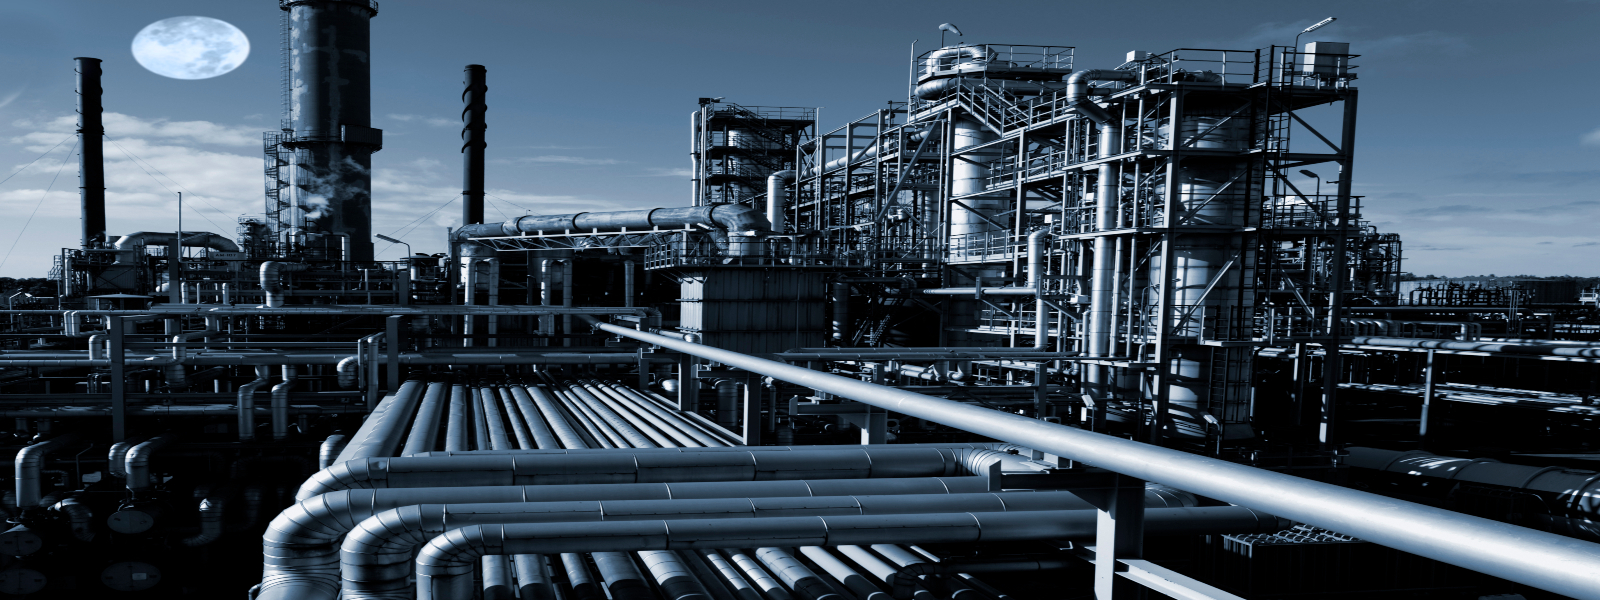 OGI Cameras for Regulatory Compliance & Leak Detection